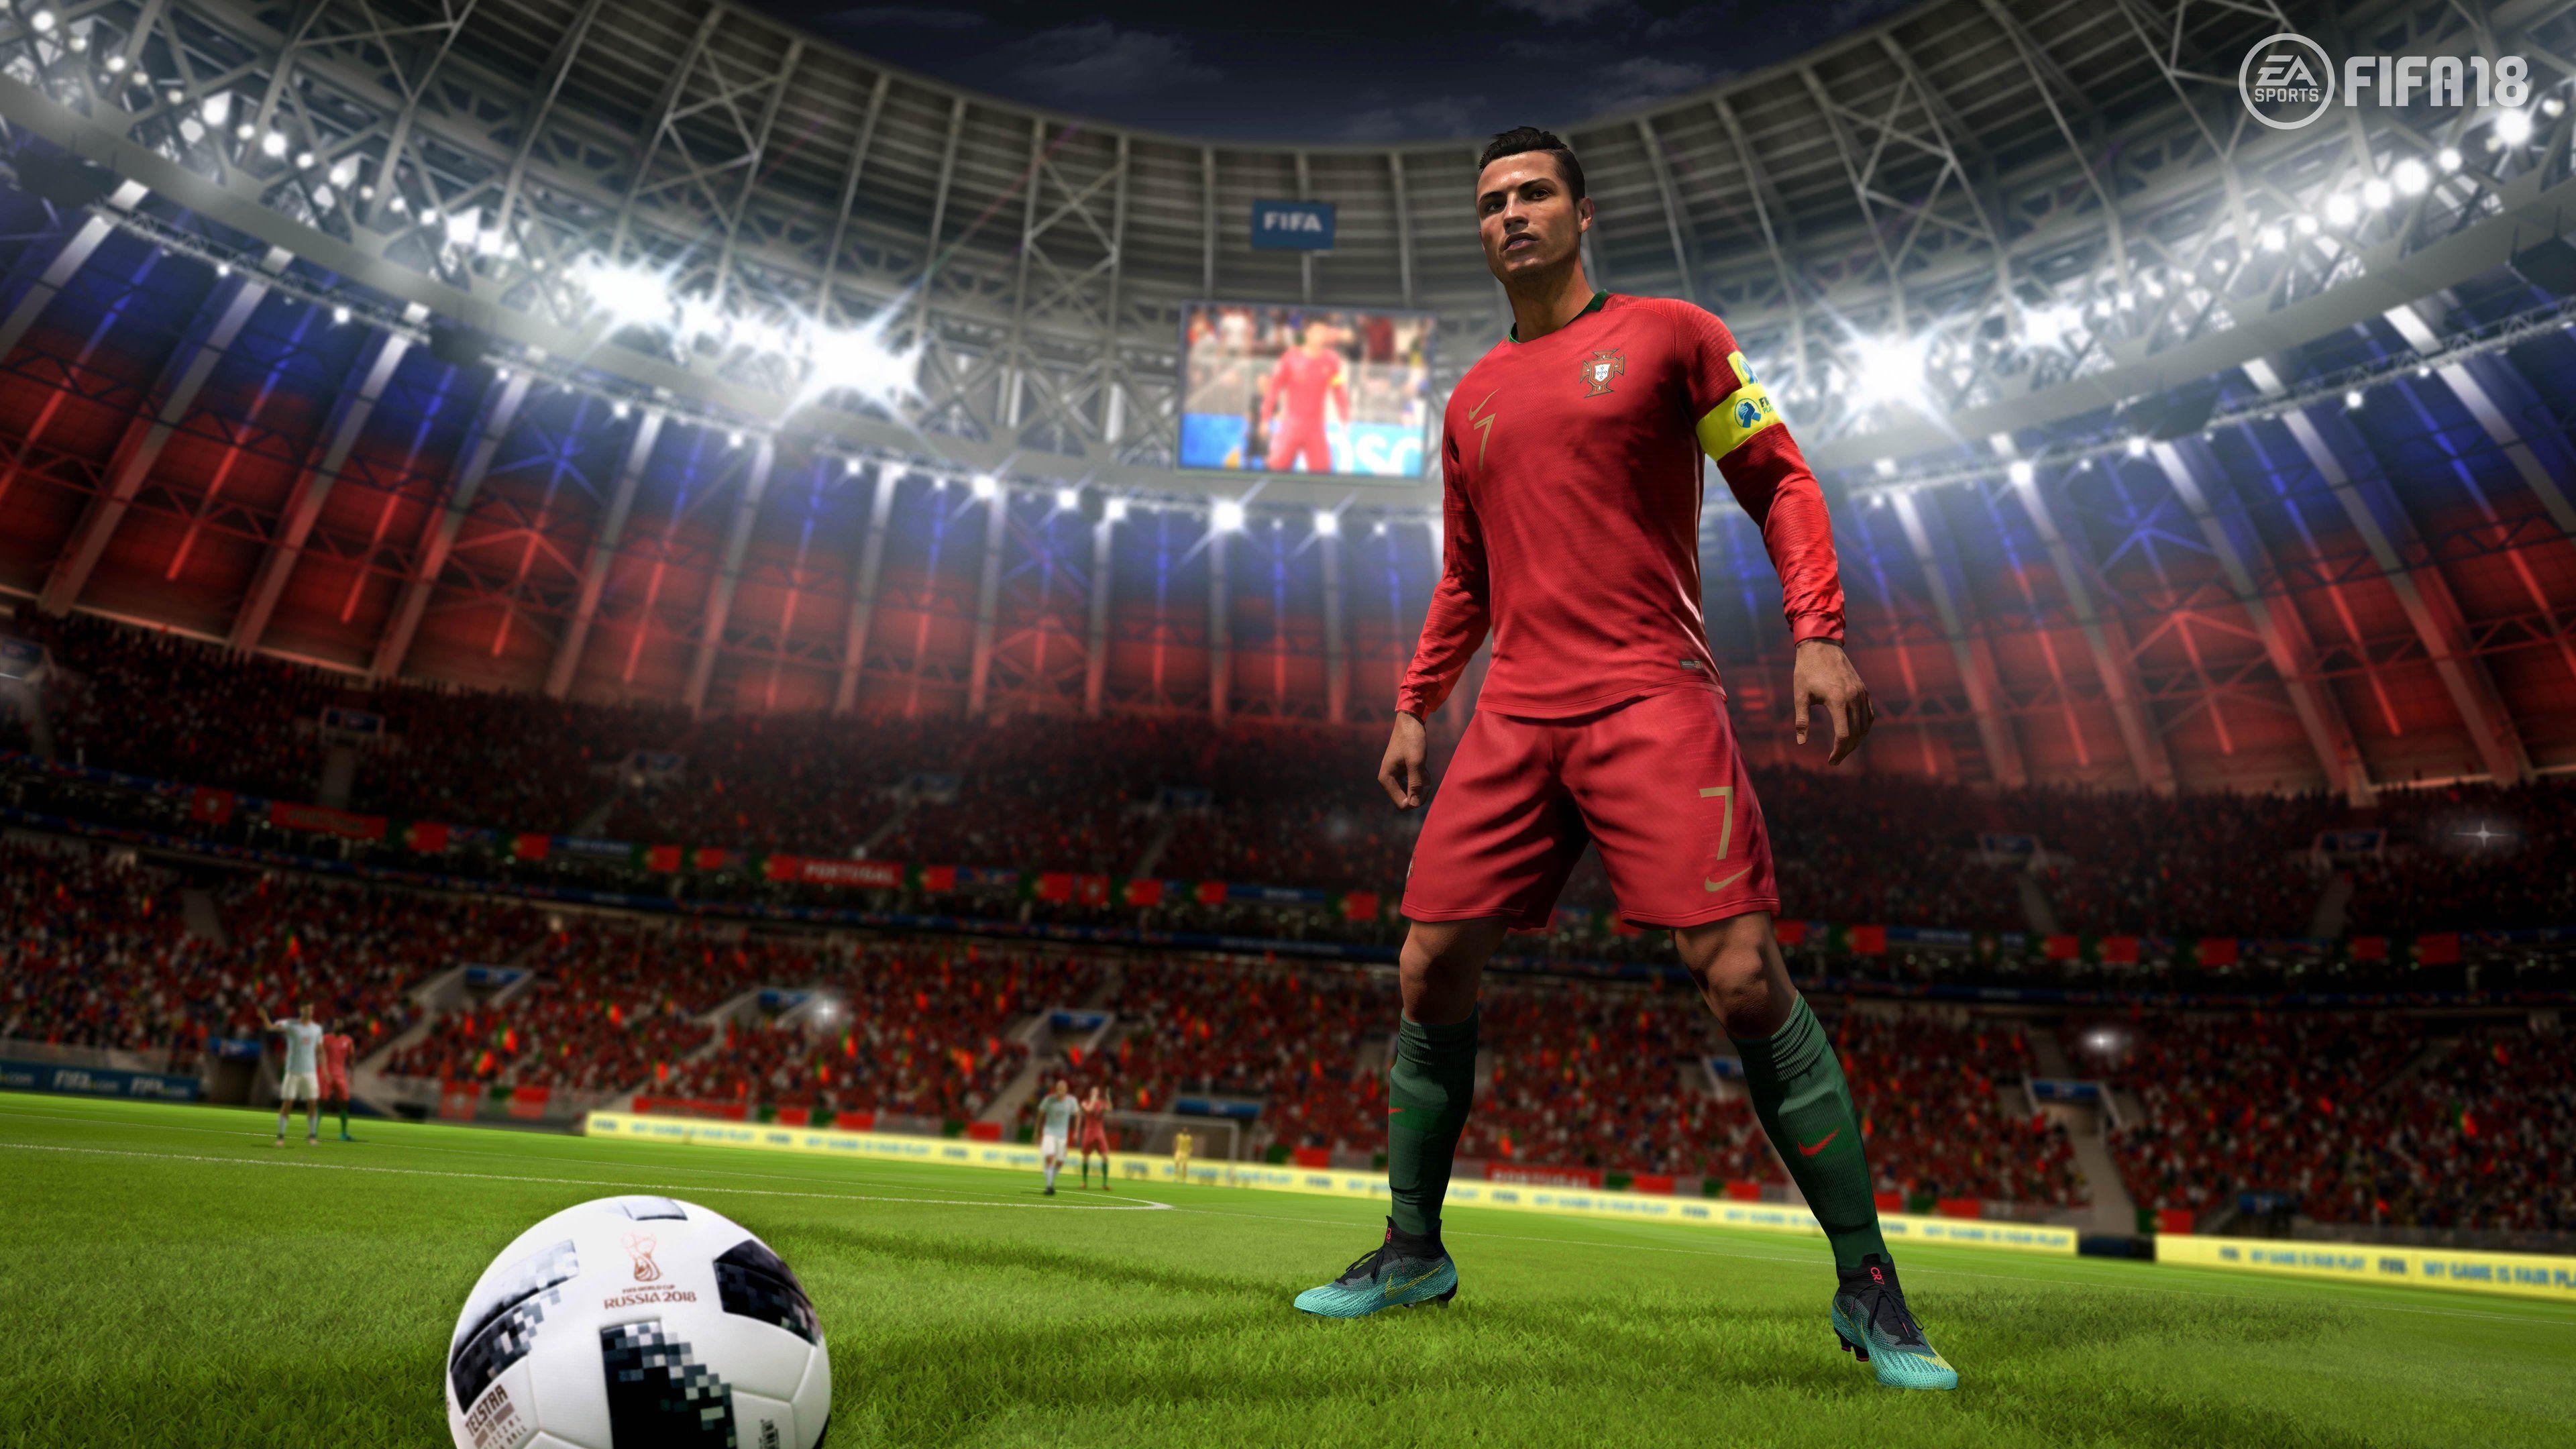 Ronaldo Fifa 18 4k sports wallpapers hd wallpapers games 3840x2160